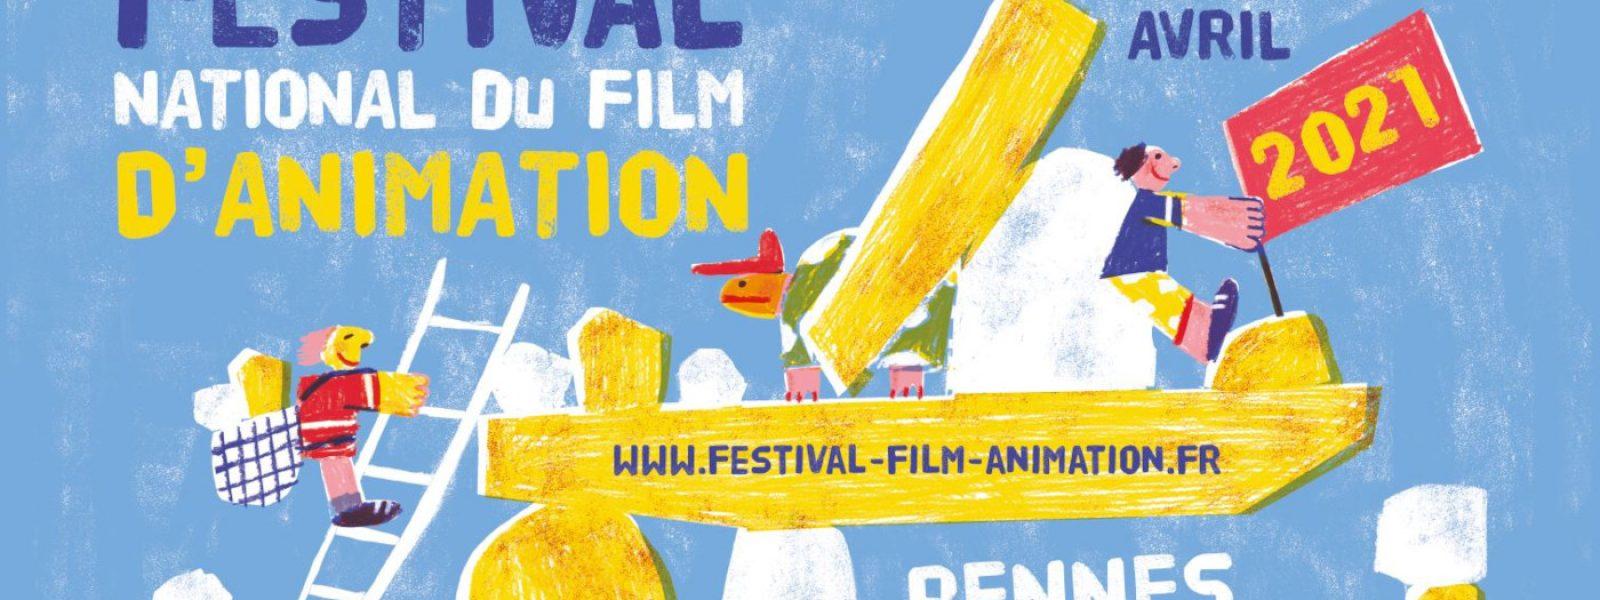 Affiche Festival film animation 2021